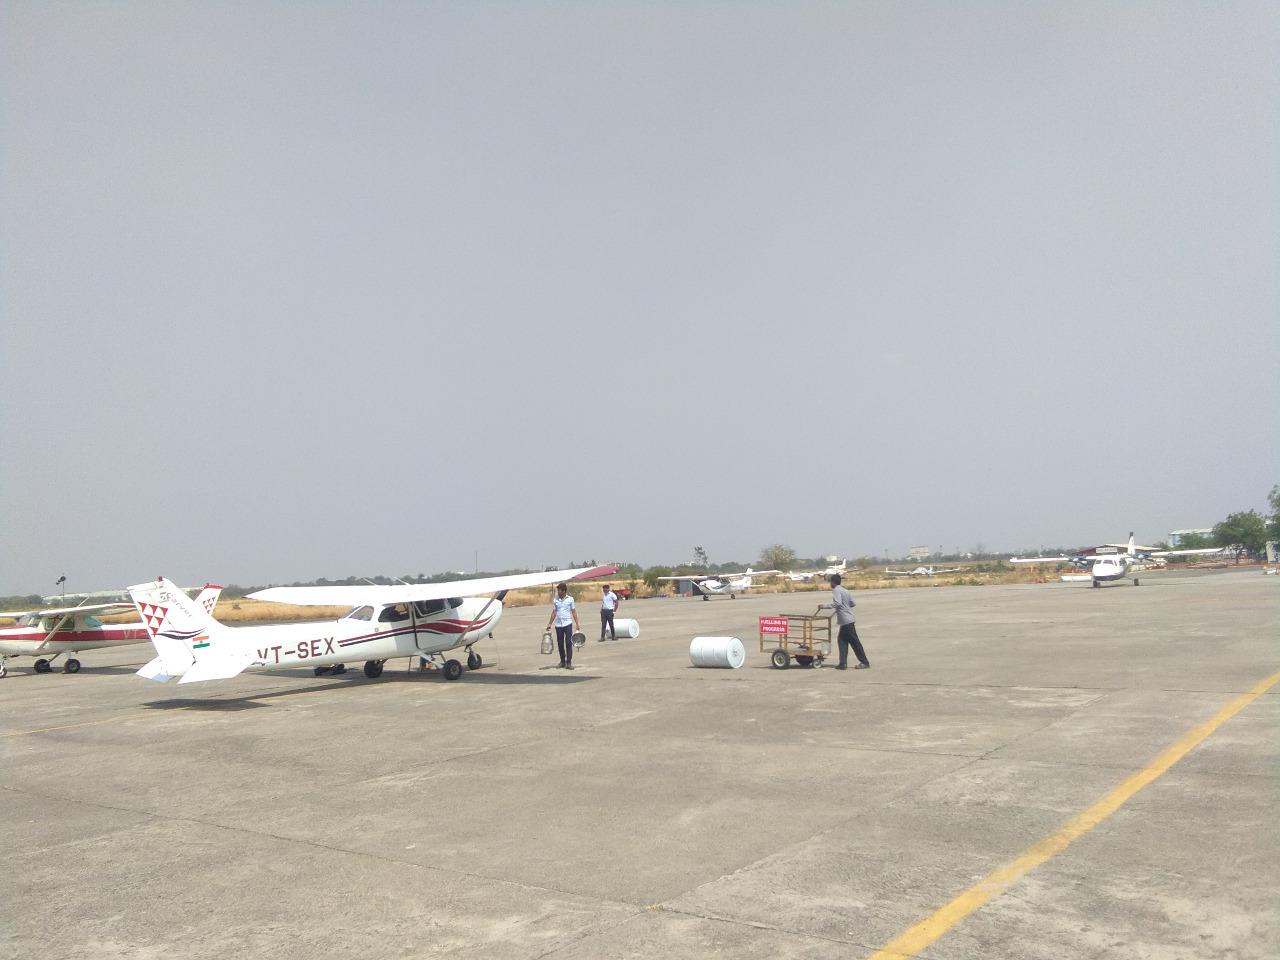 Airport Prafulla Khude